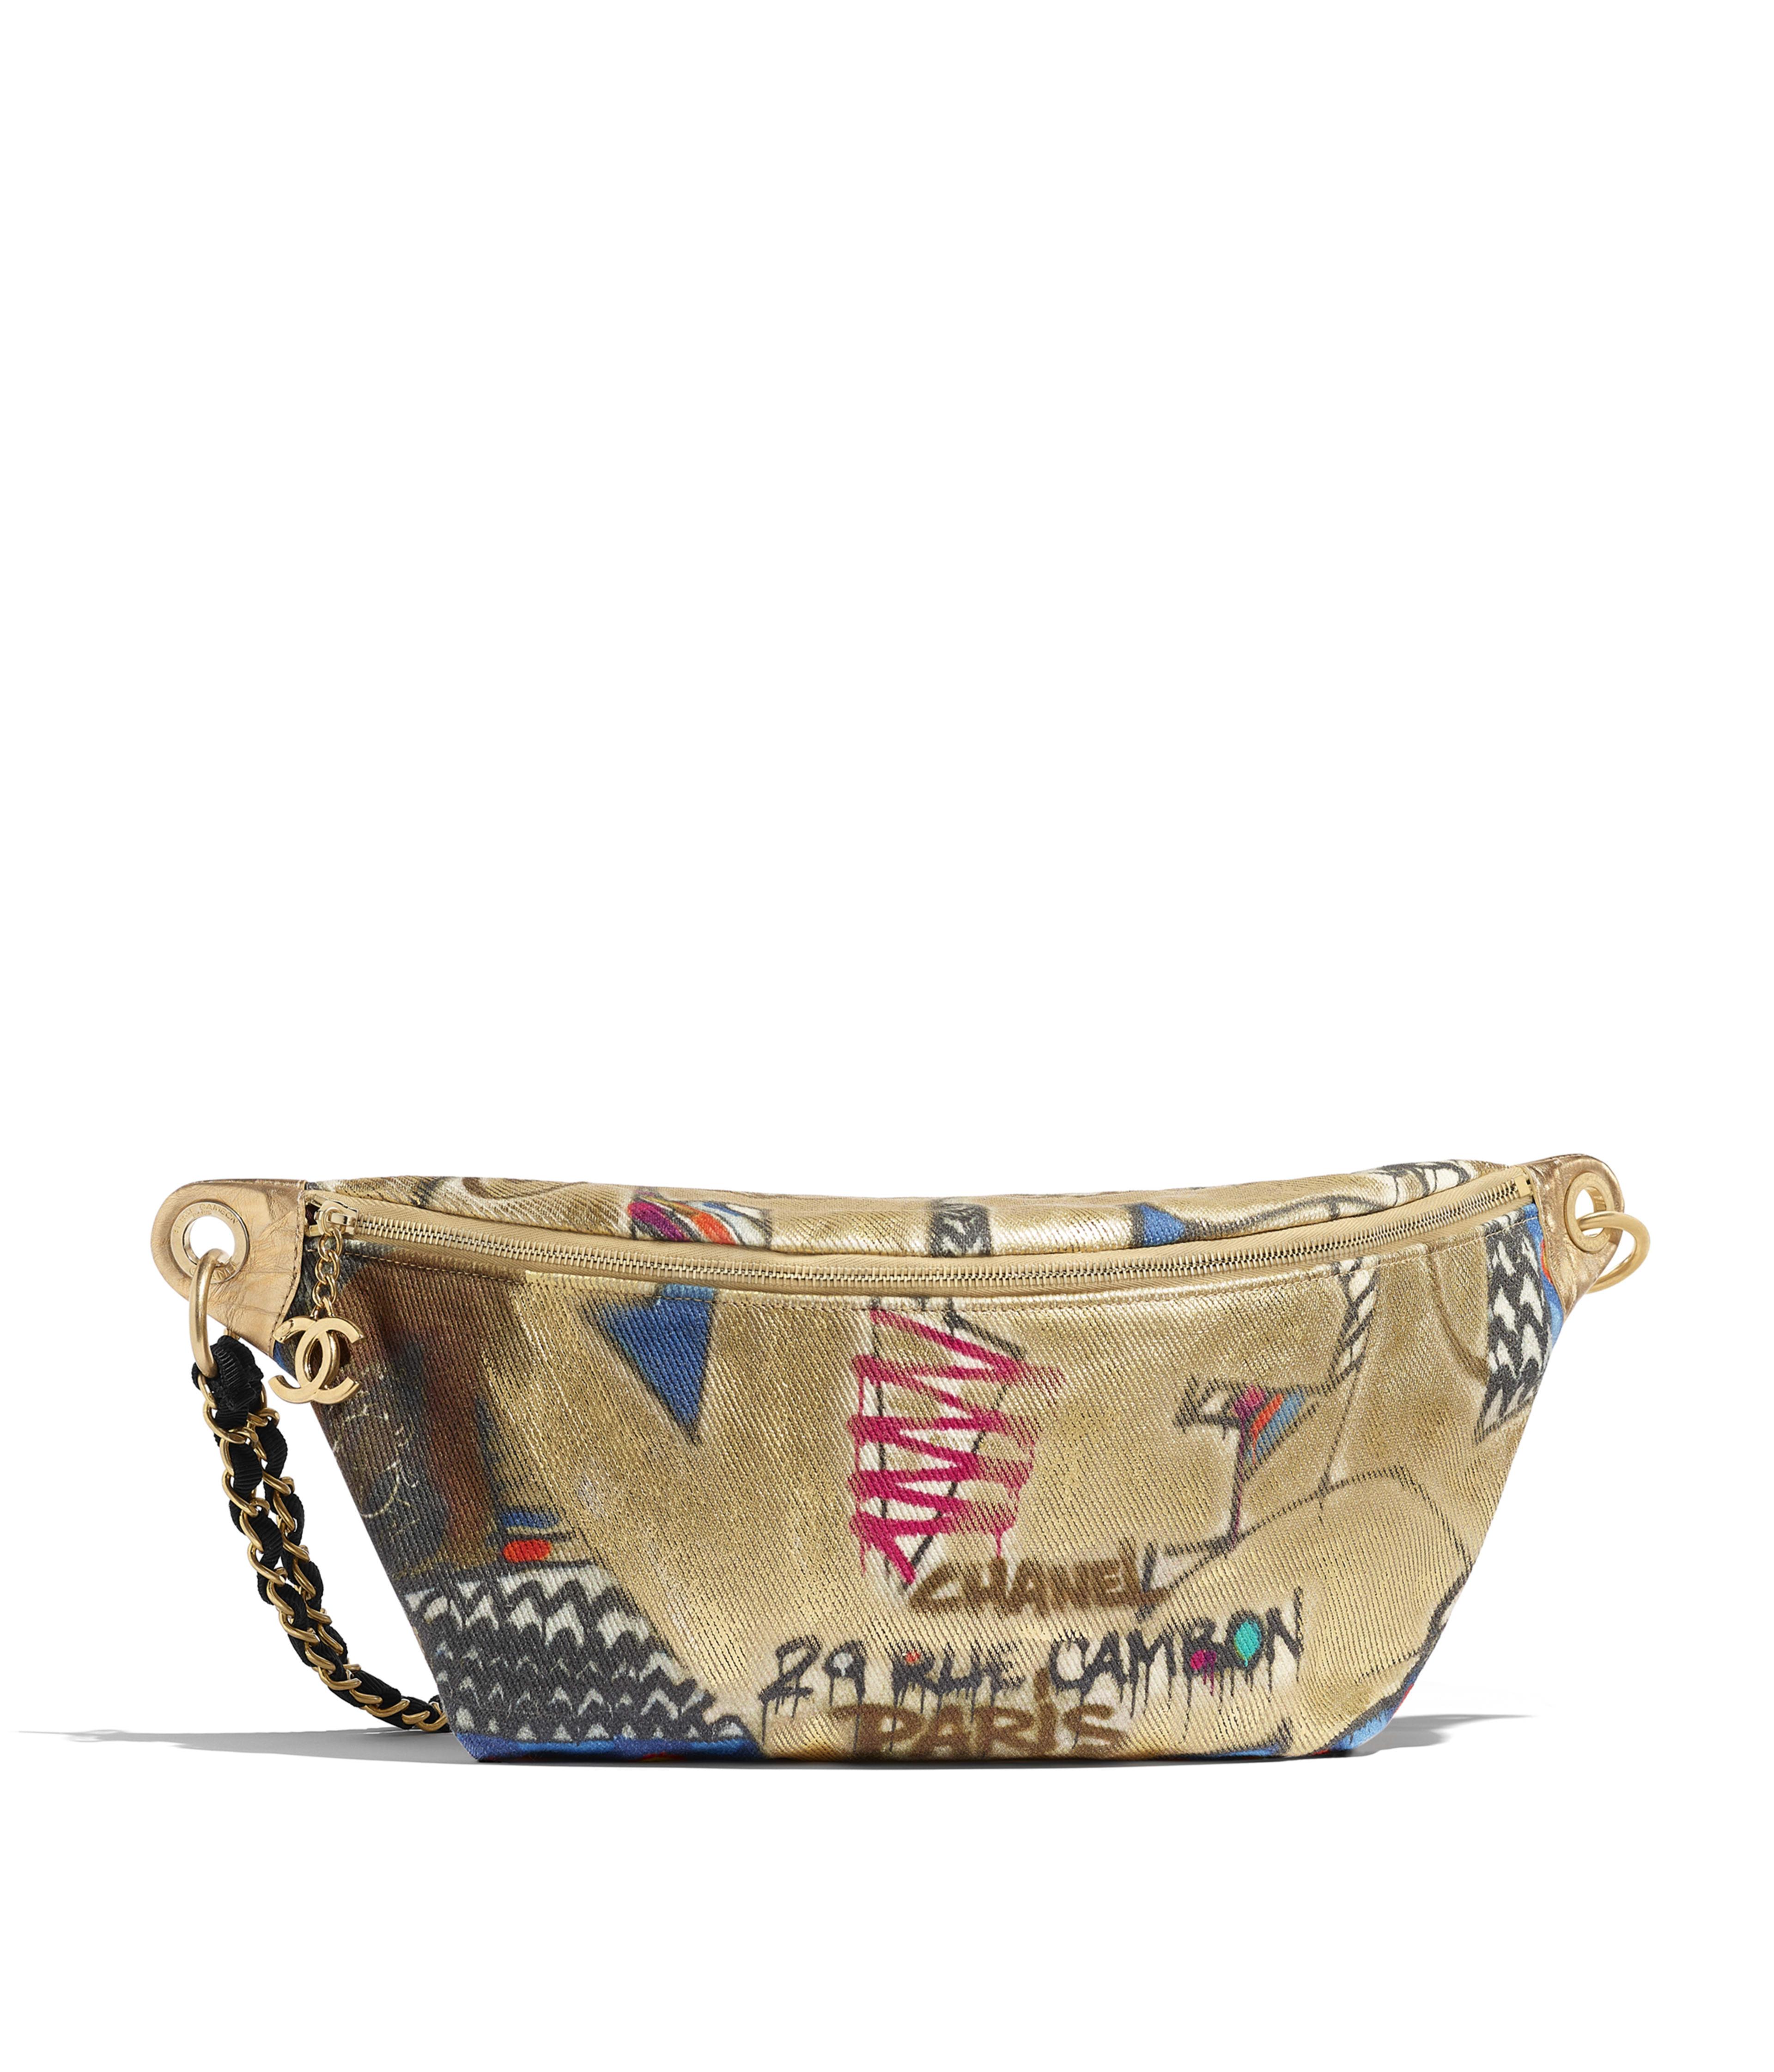 9ad2b9b4dd34 Waist Bag Calfskin, Cotton & Gold-Tone Metal, Multicolor Ref.  AS0868B0090099999